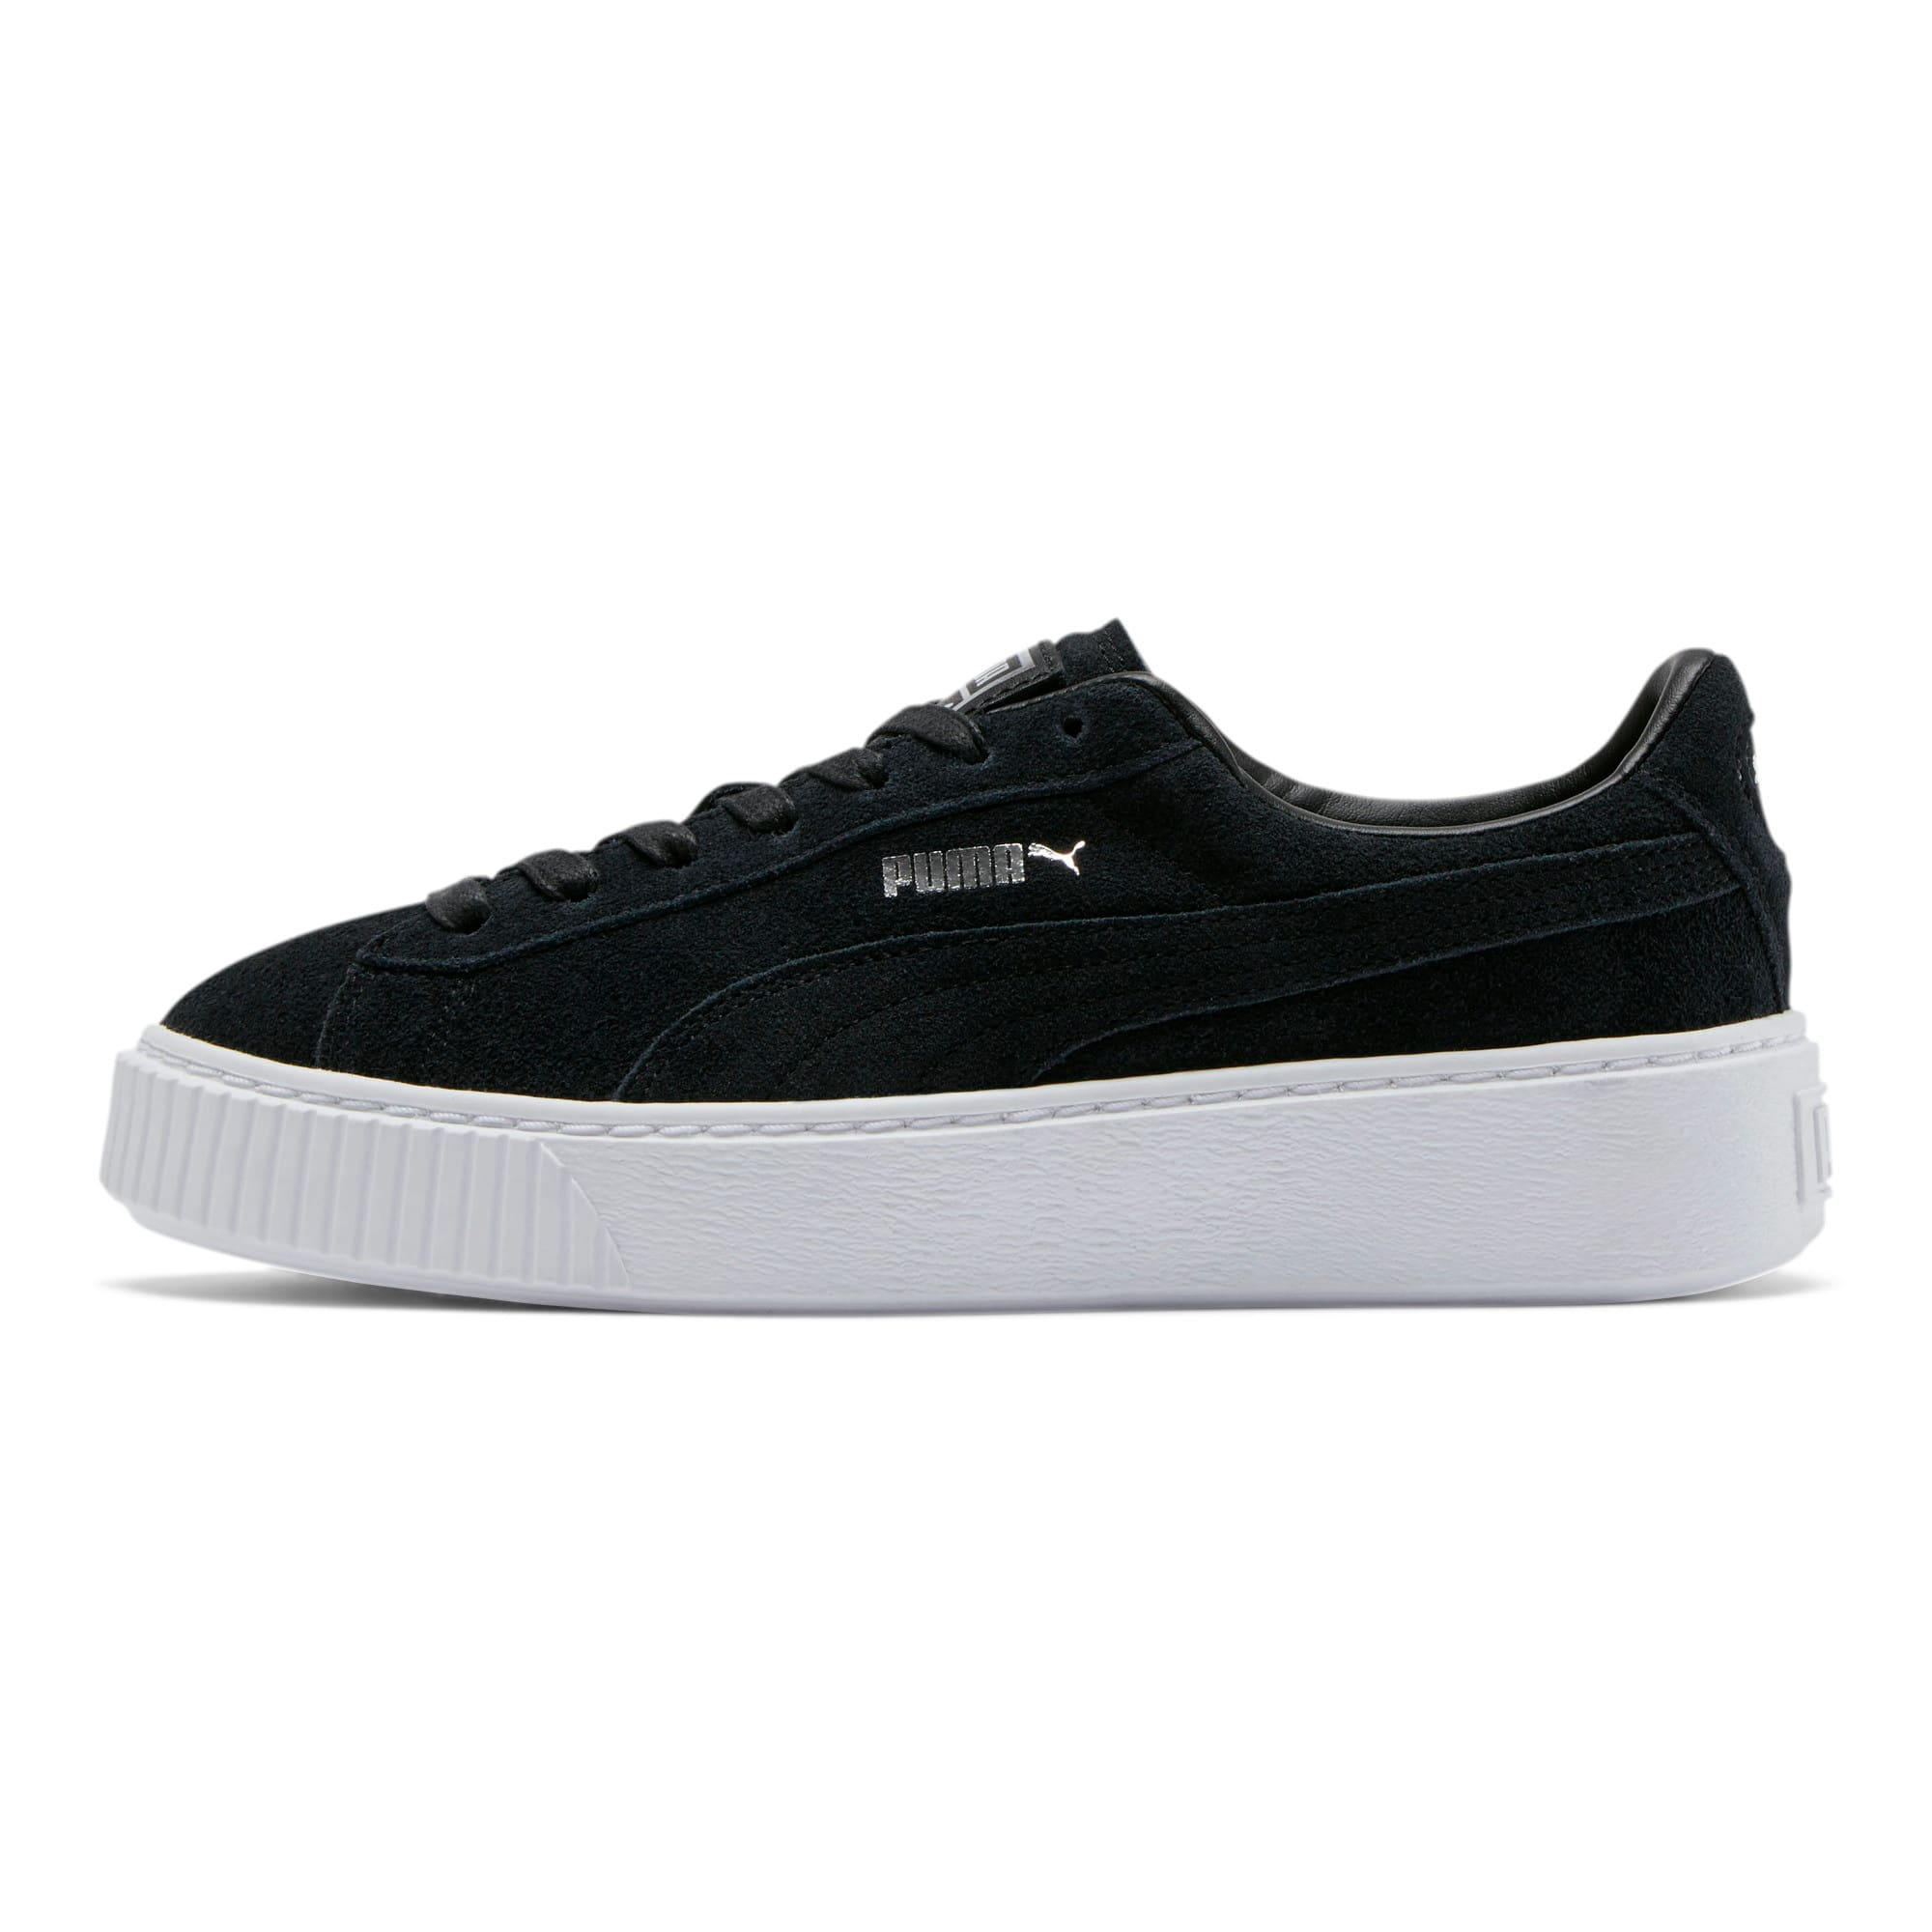 Buy Puma Black Suede Platform Street 2 Shoes for Girls